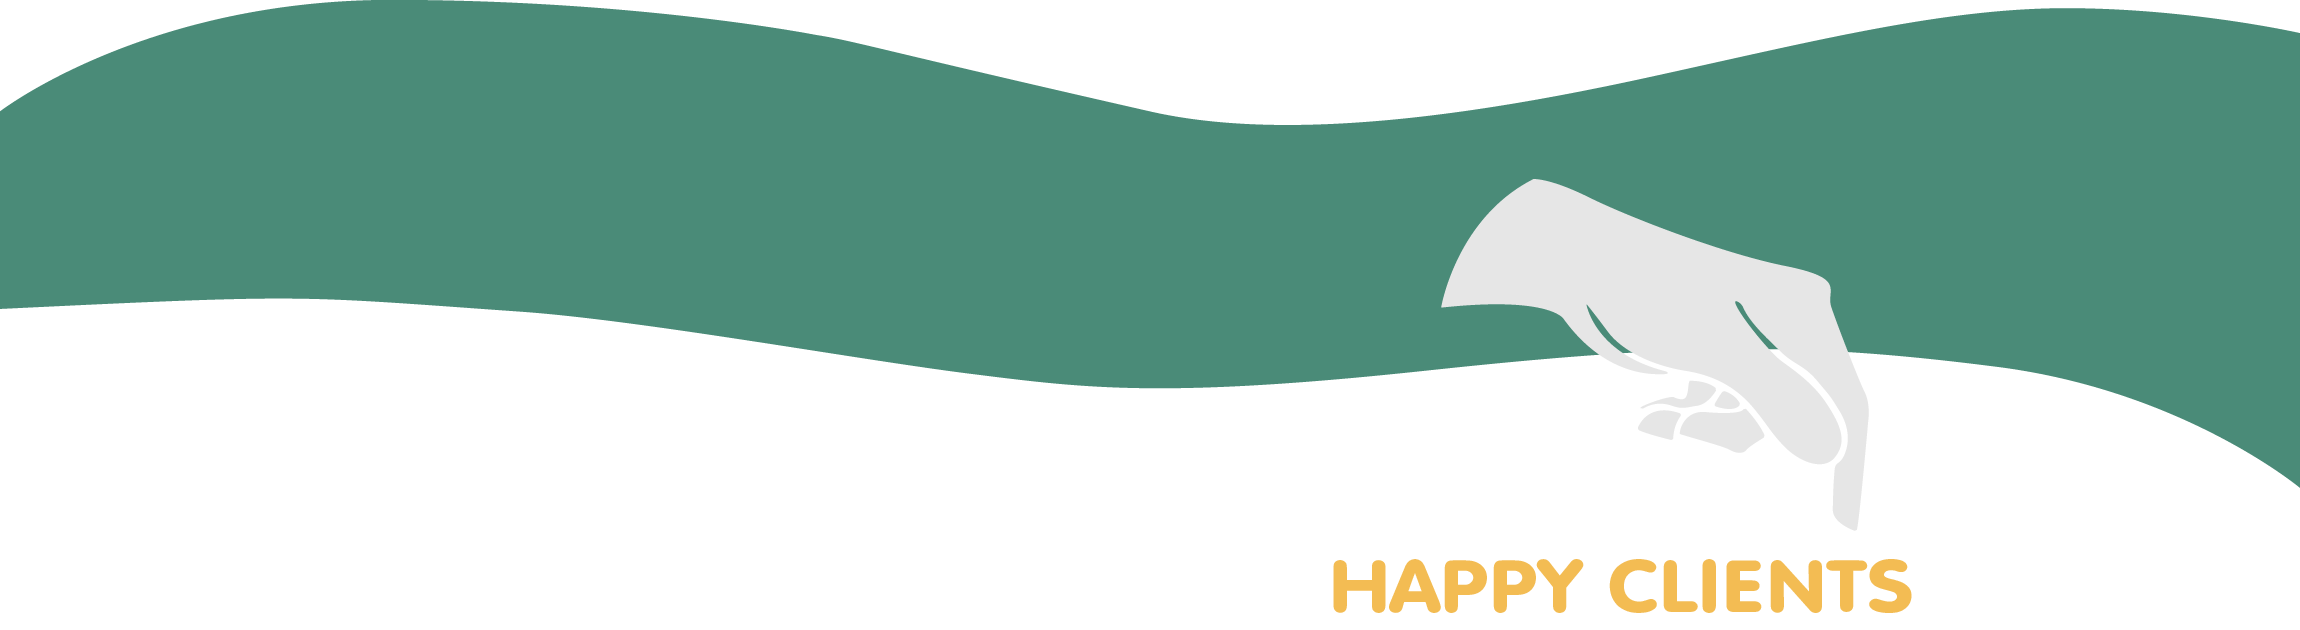 handje-divider-2